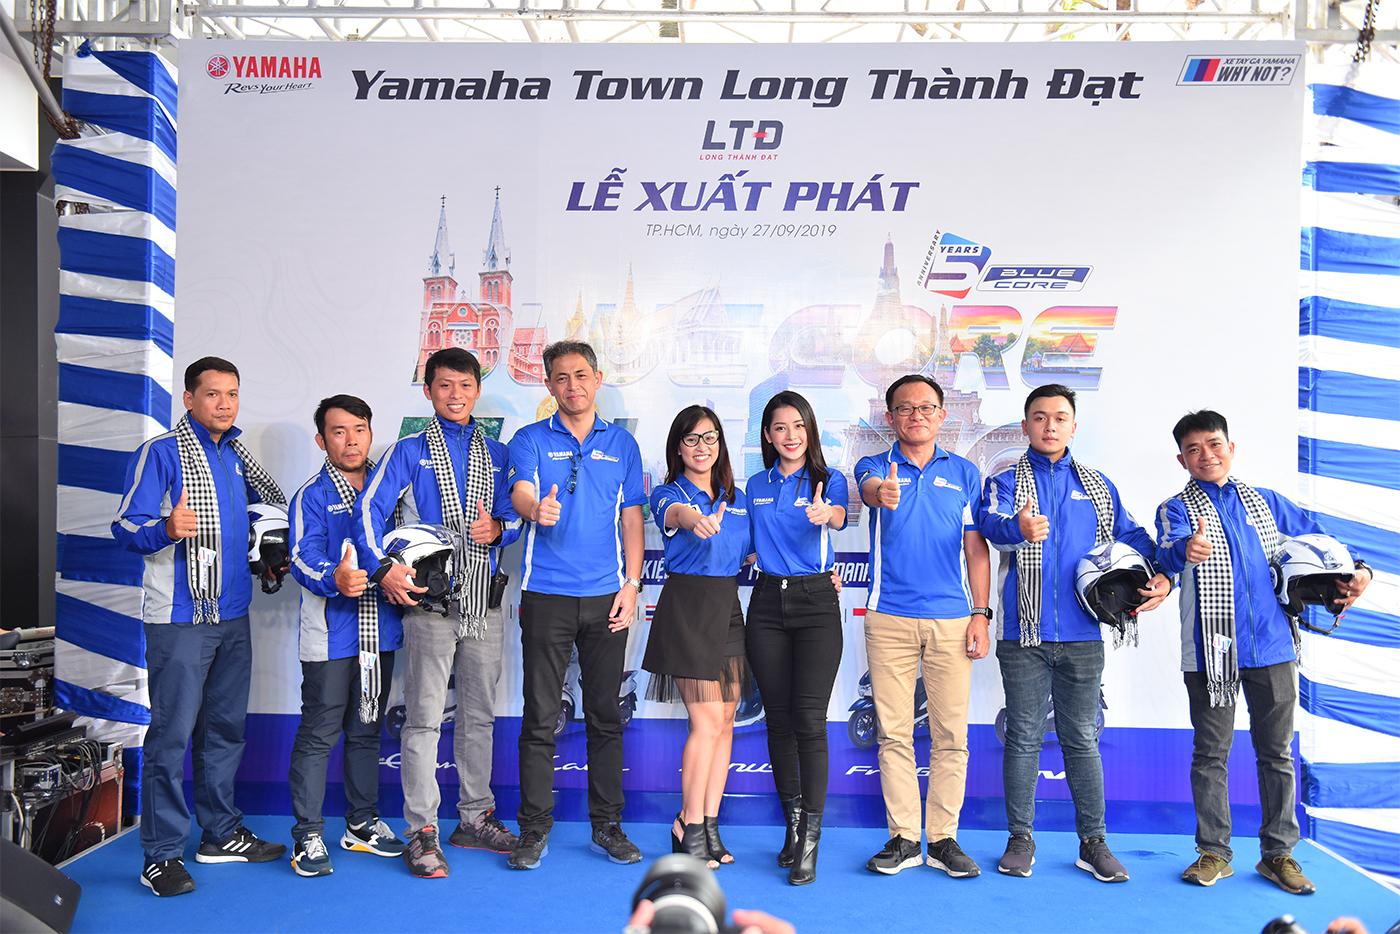 yamaha-motor-viet-nam-ky-niem-5-nam-dong-co-blue-core-va-hanh-trinh-asean-blue-core-touring-2.JPG